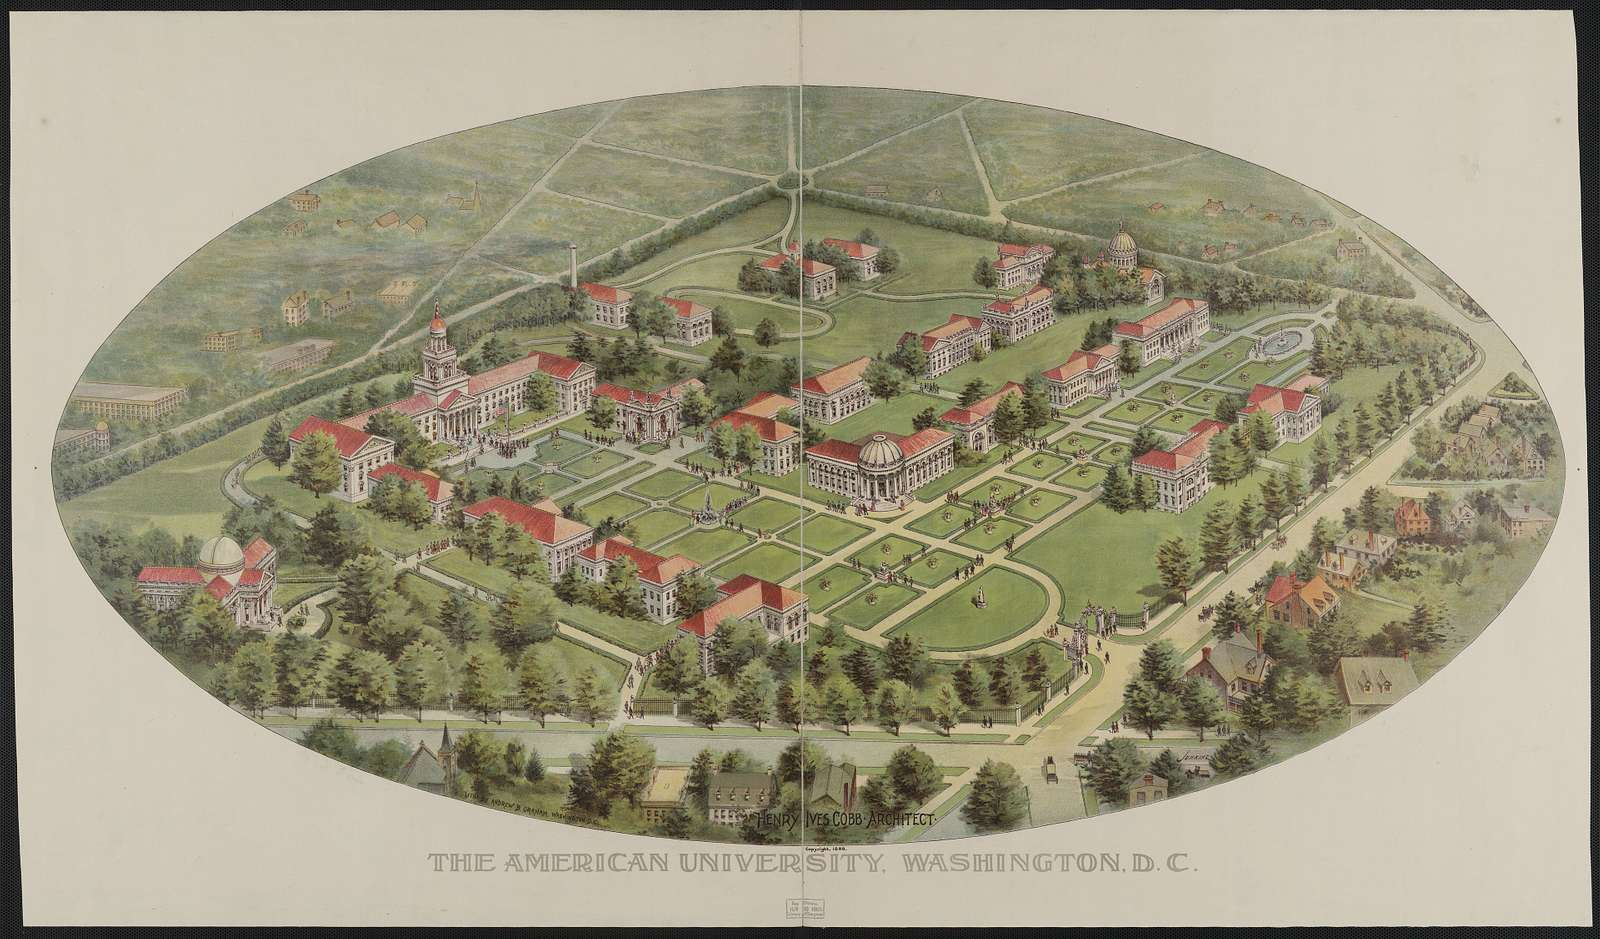 The American University, Washington, D.C.